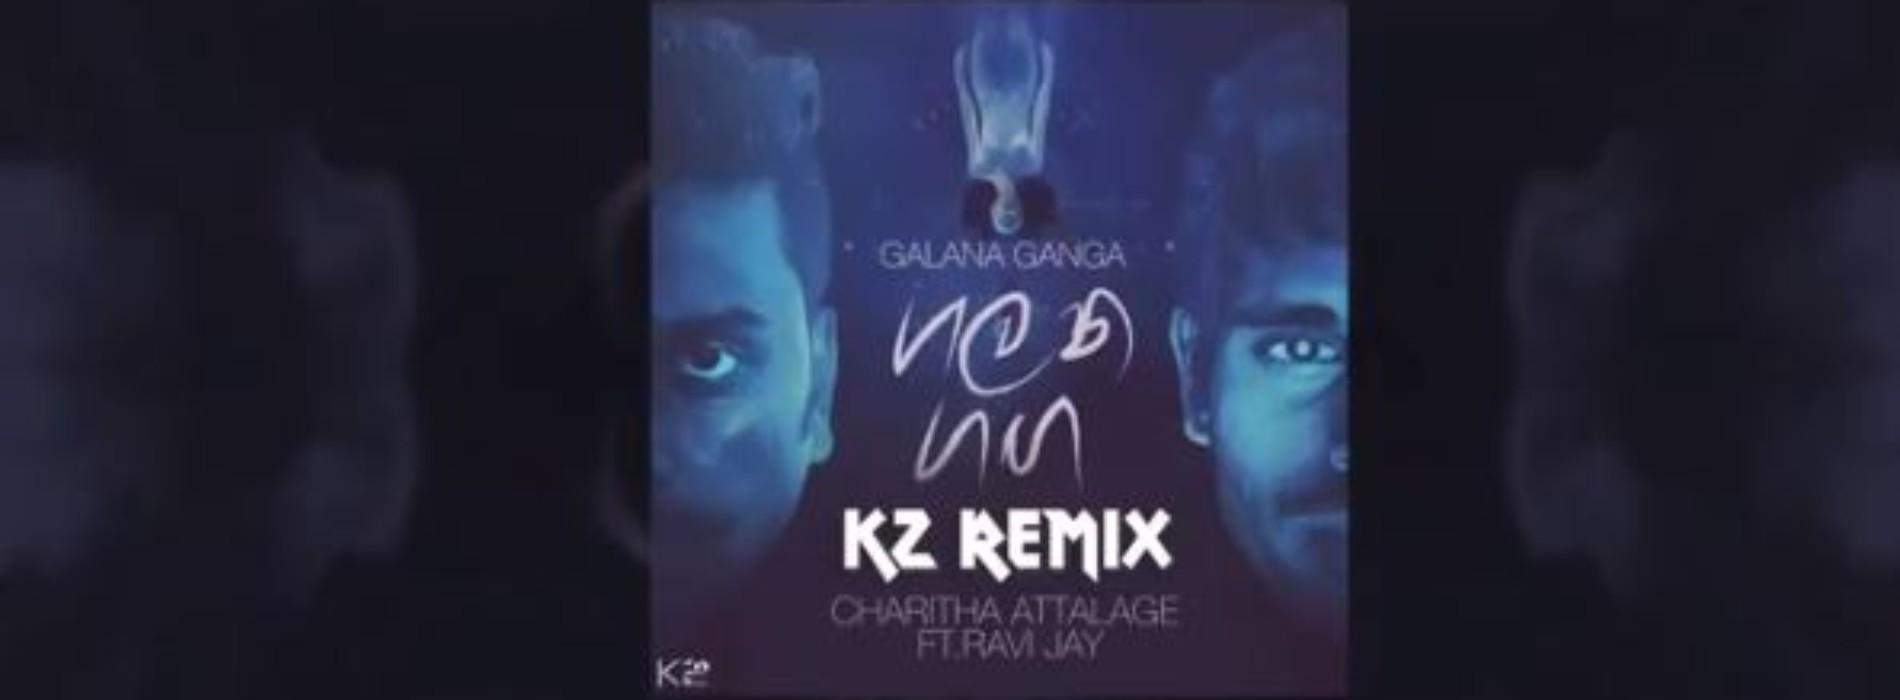 K2 – Ravi Jay Ft Charitha Attalage : Galana Ganga ගලන ගඟ  (Remix)